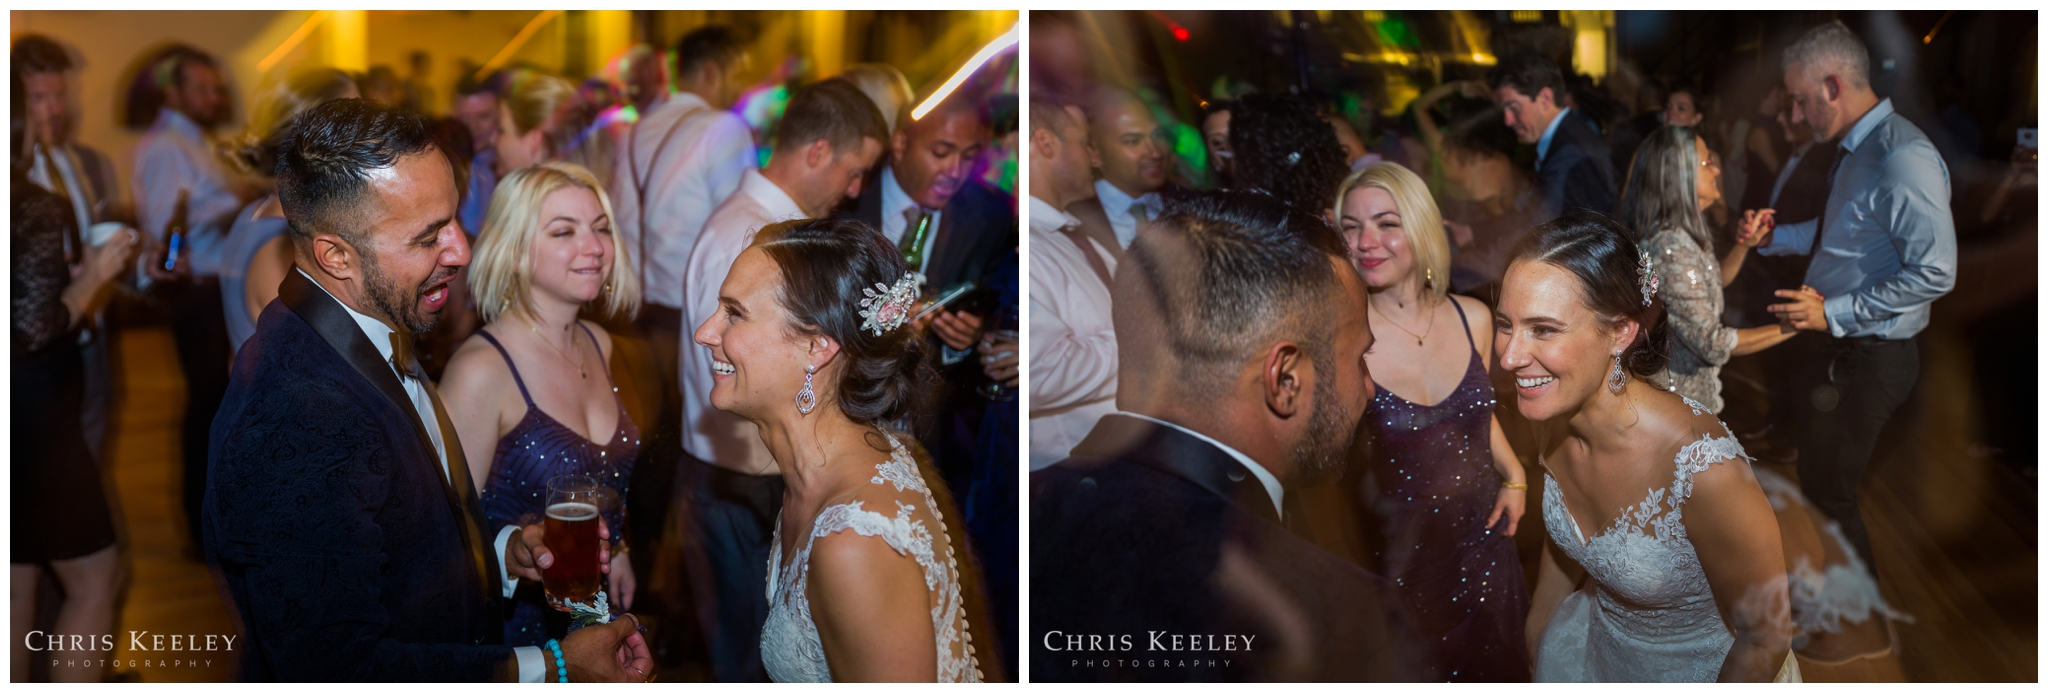 grace-restaurant-portland-maine-wedding-photographer-chris-keeley-66.jpg